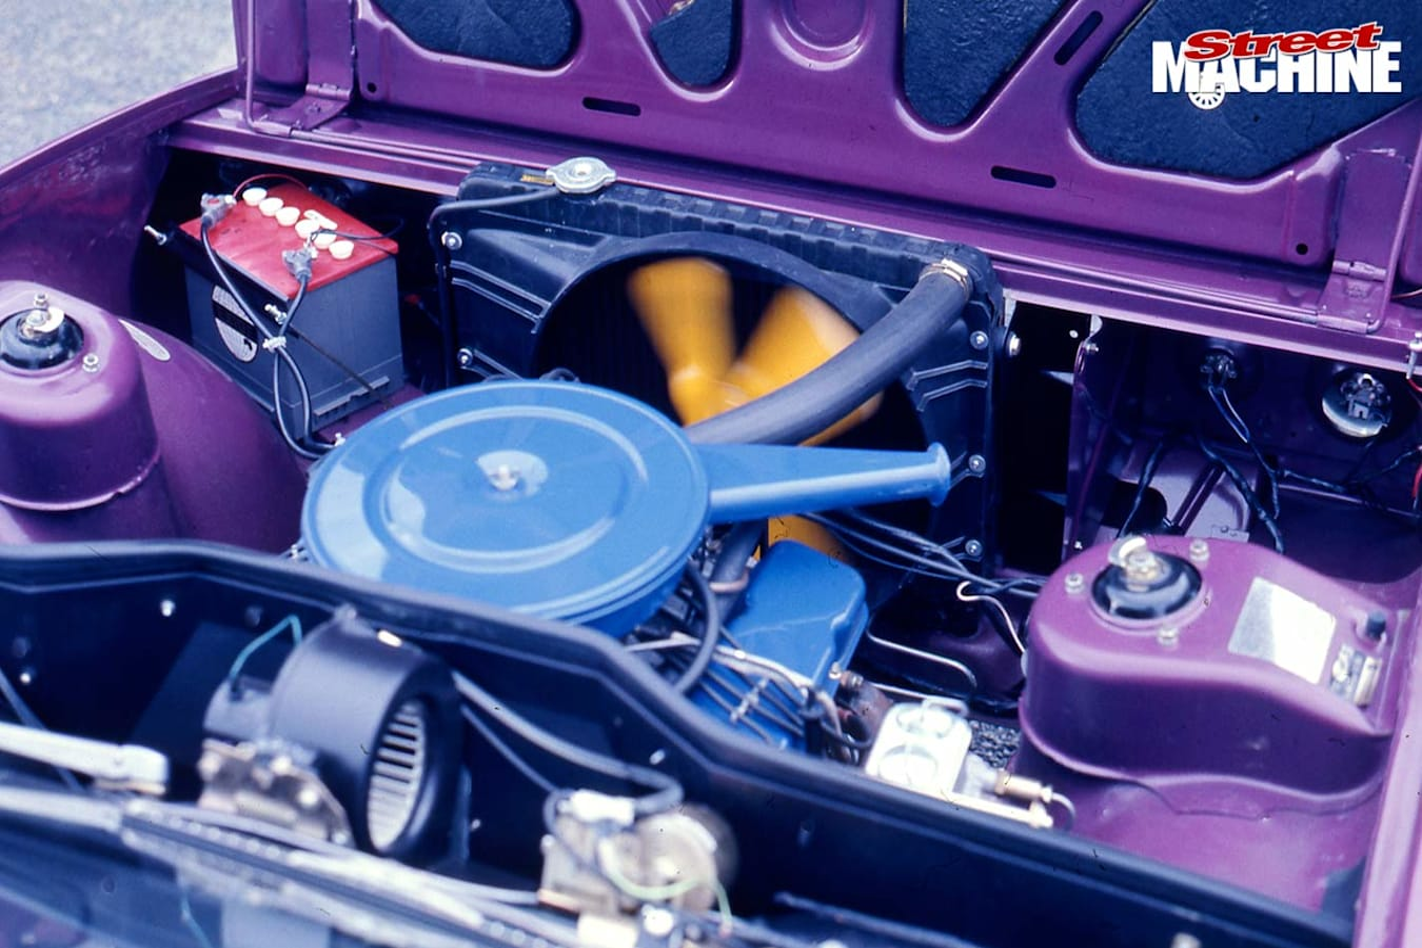 Leyland P76 engine bay